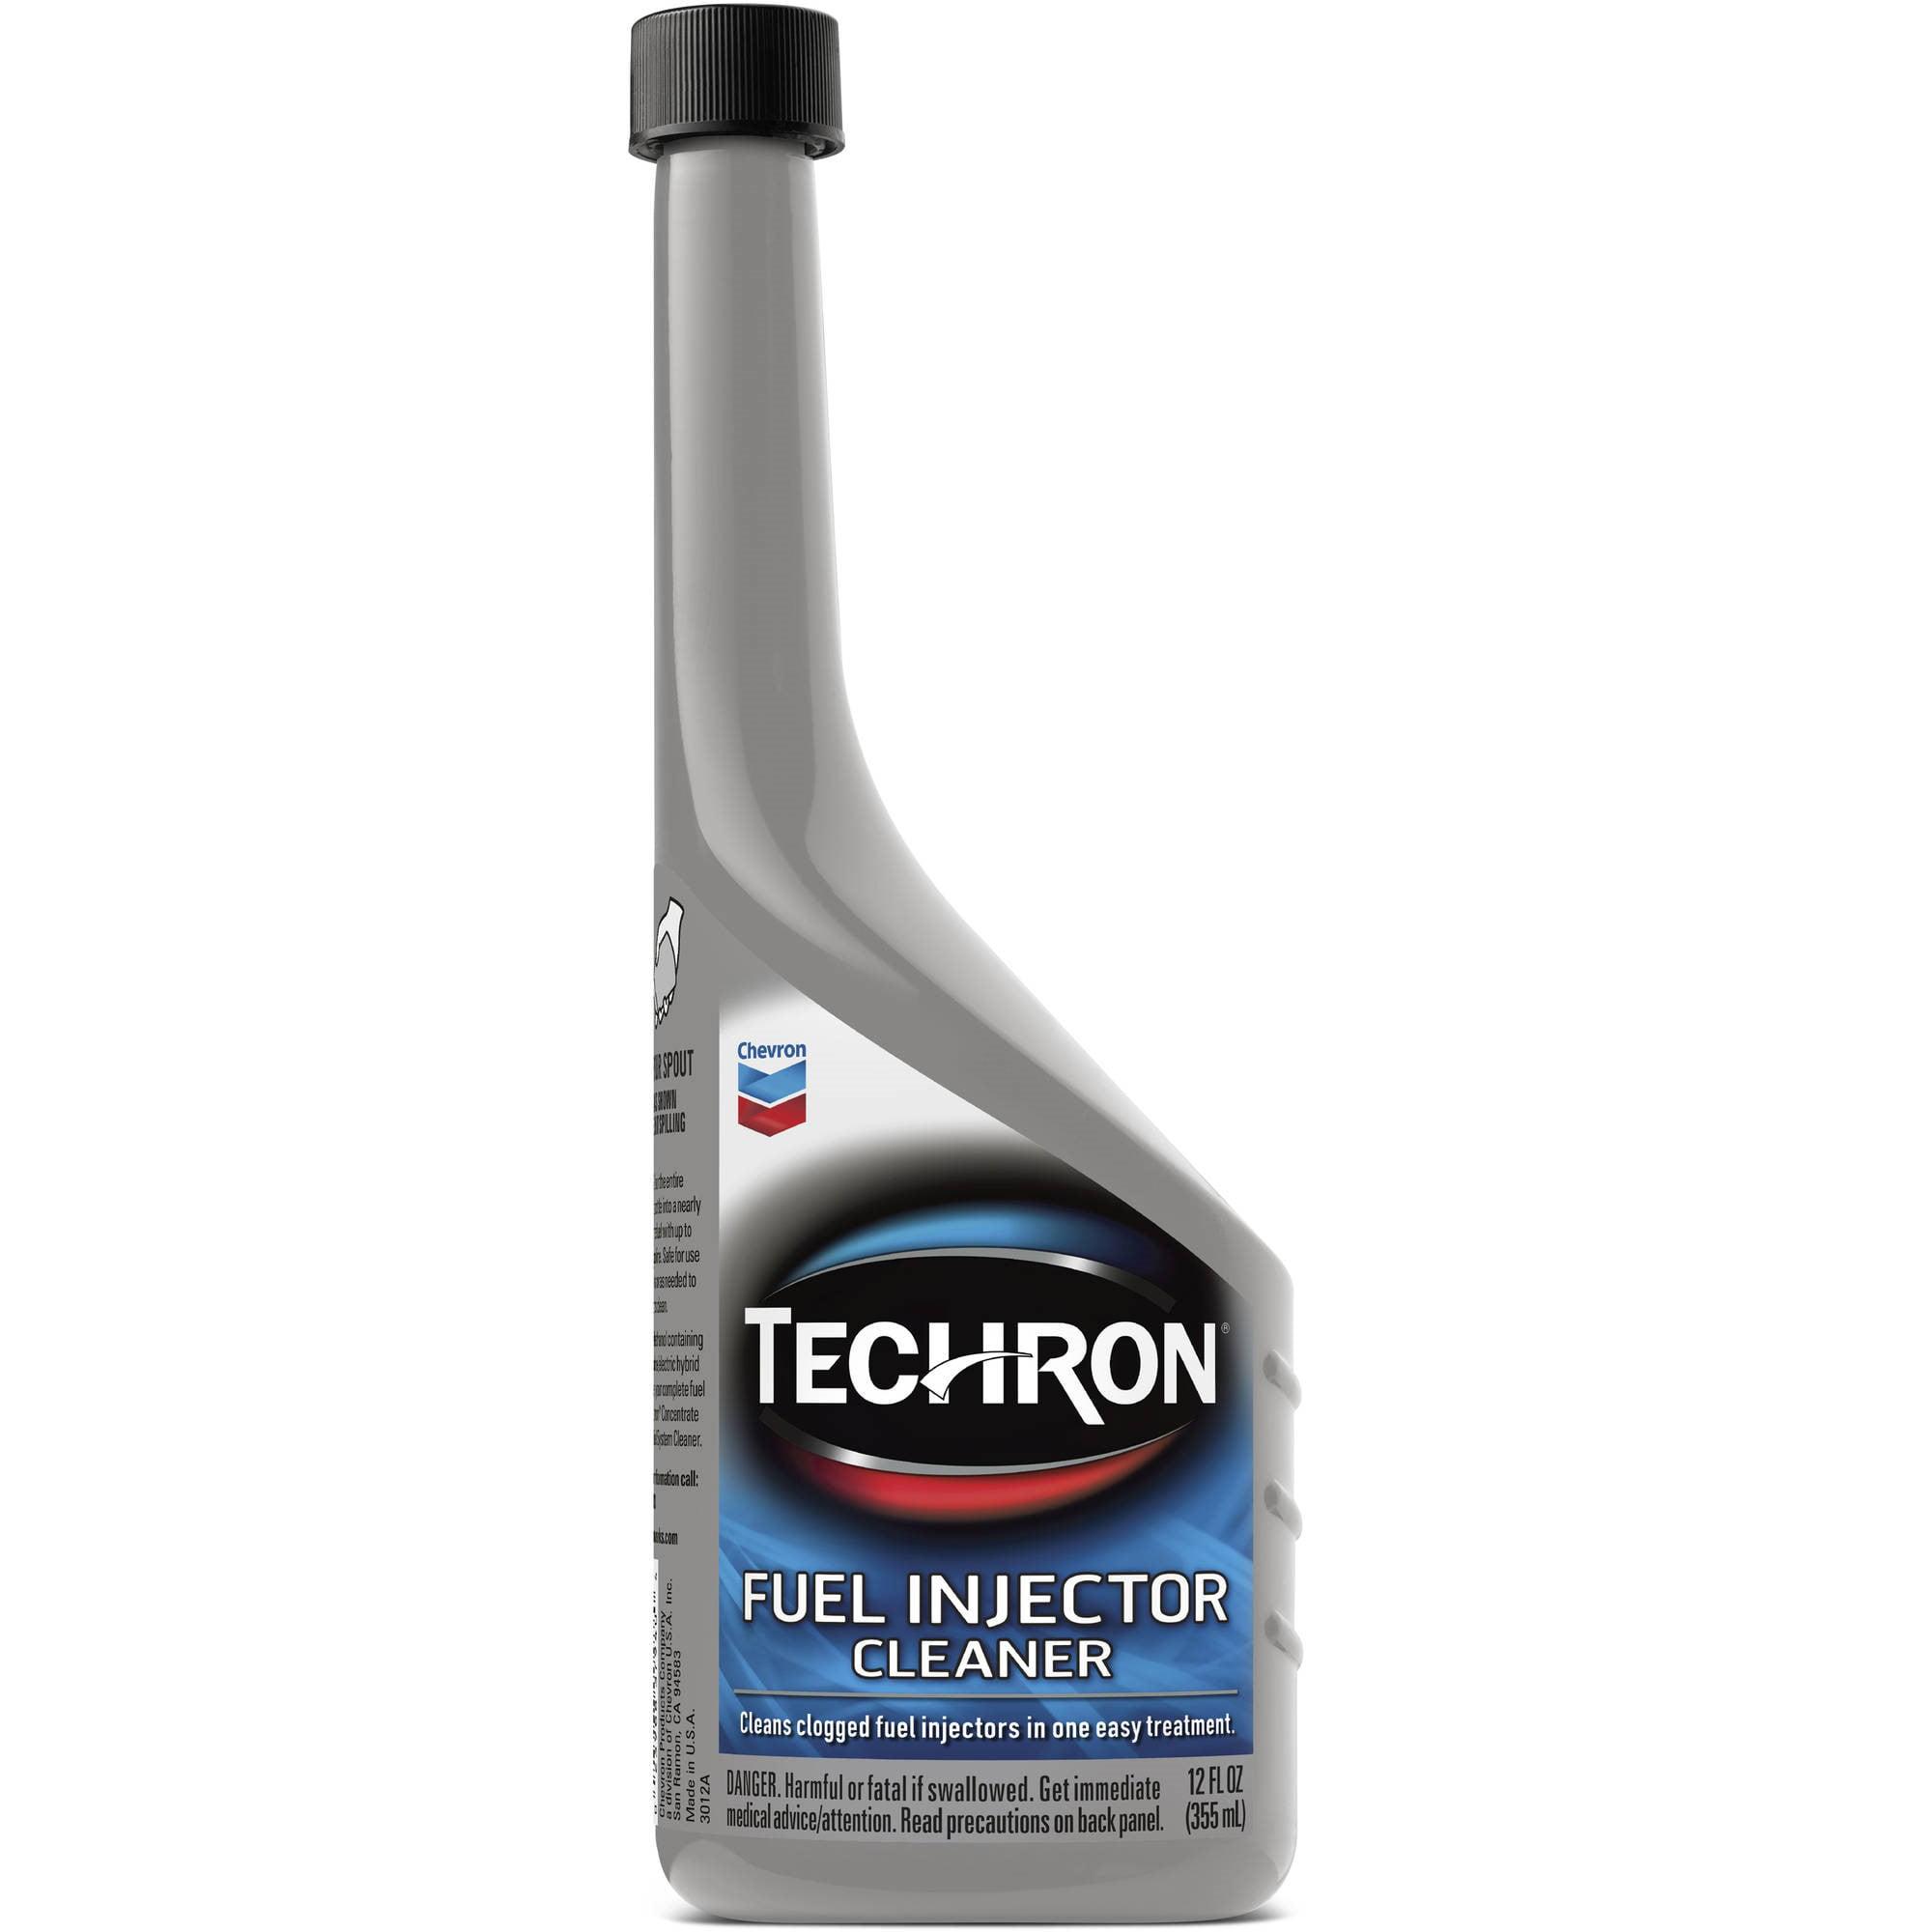 Chevron Techron Fuel Injector Cleaner, 12 oz by Techron